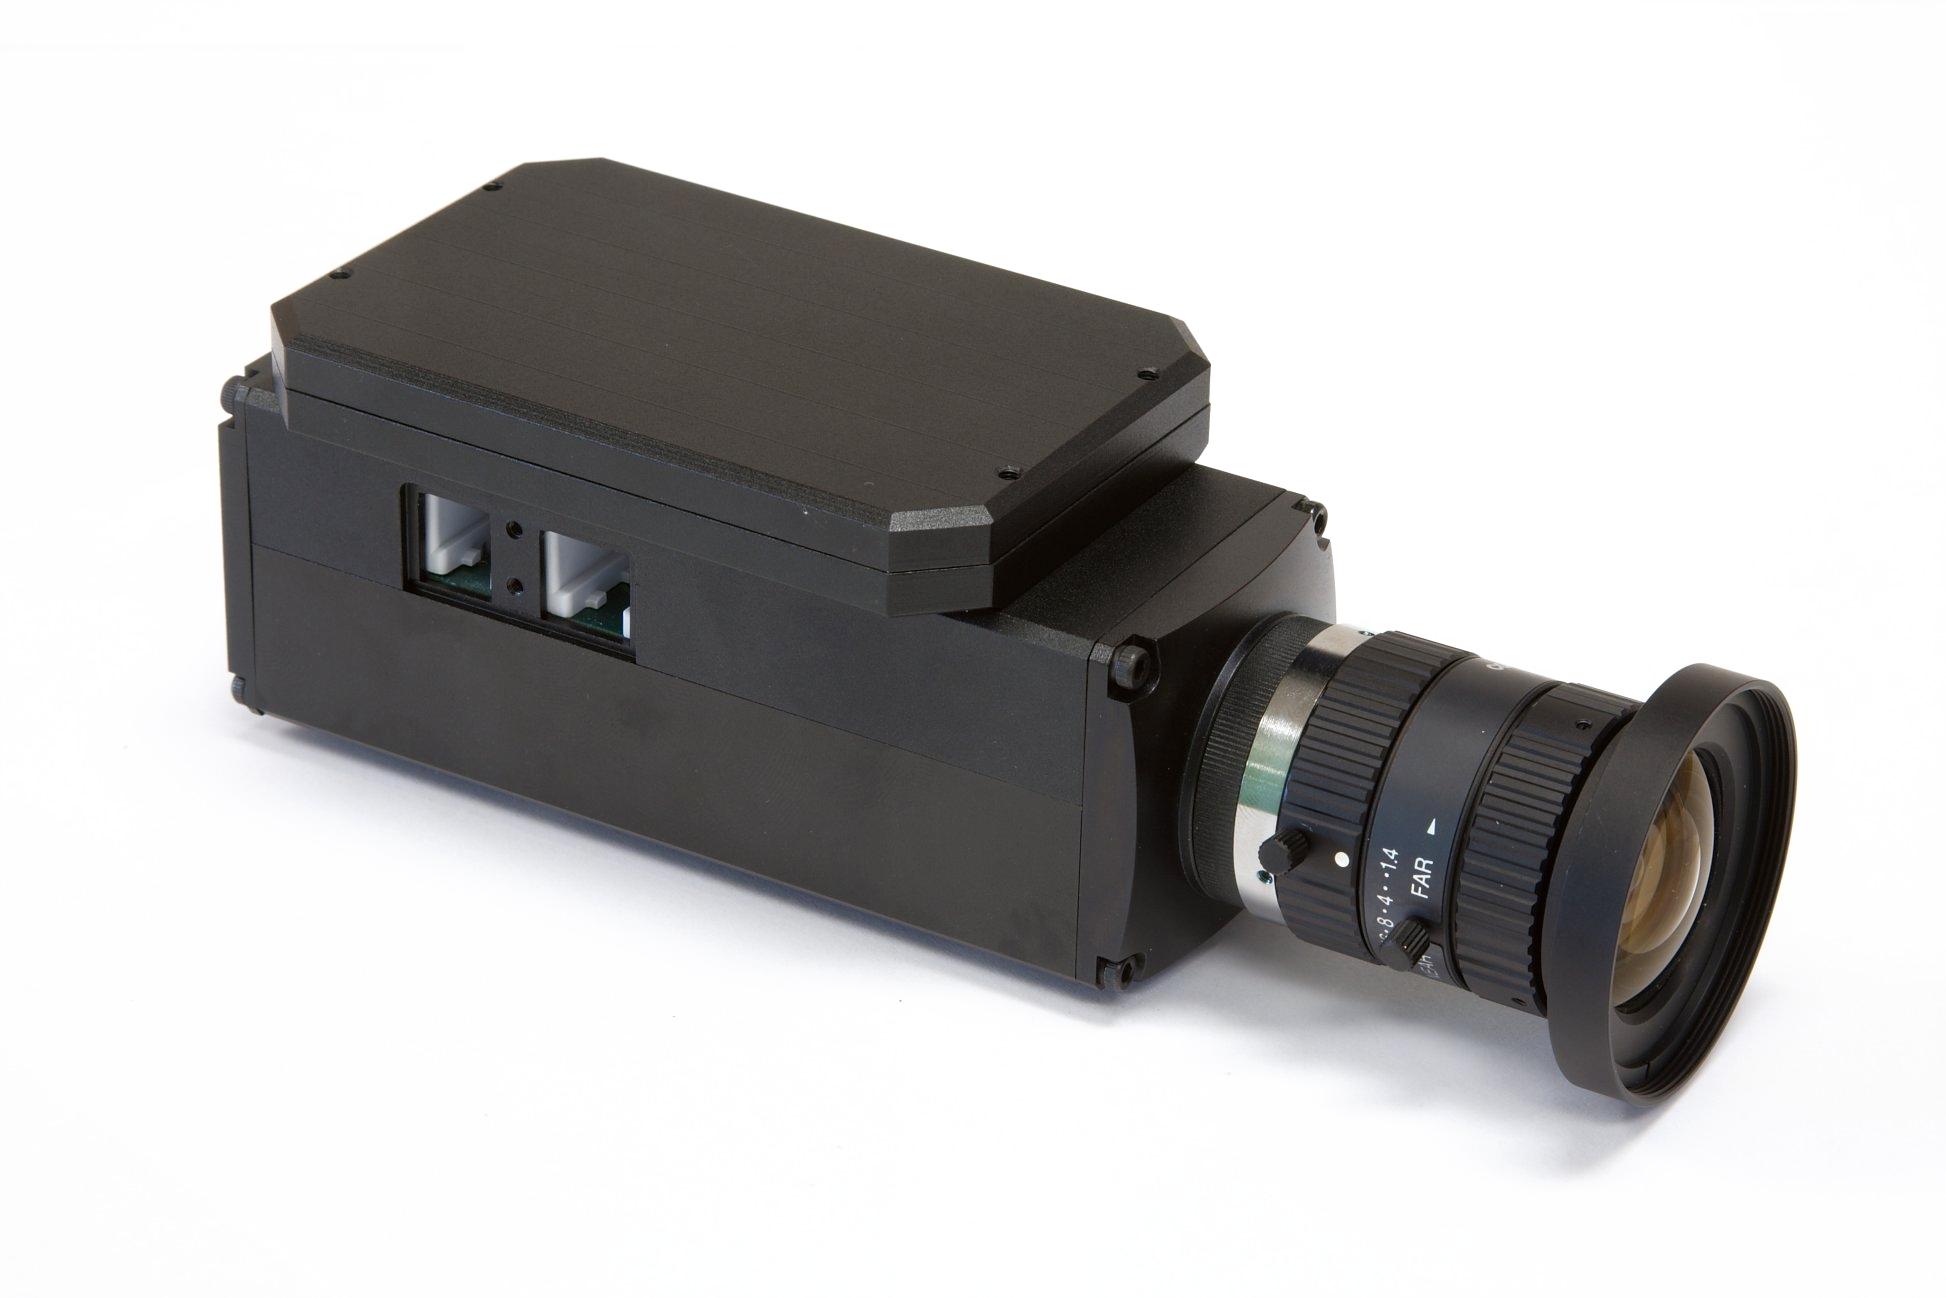 Elphel Camera